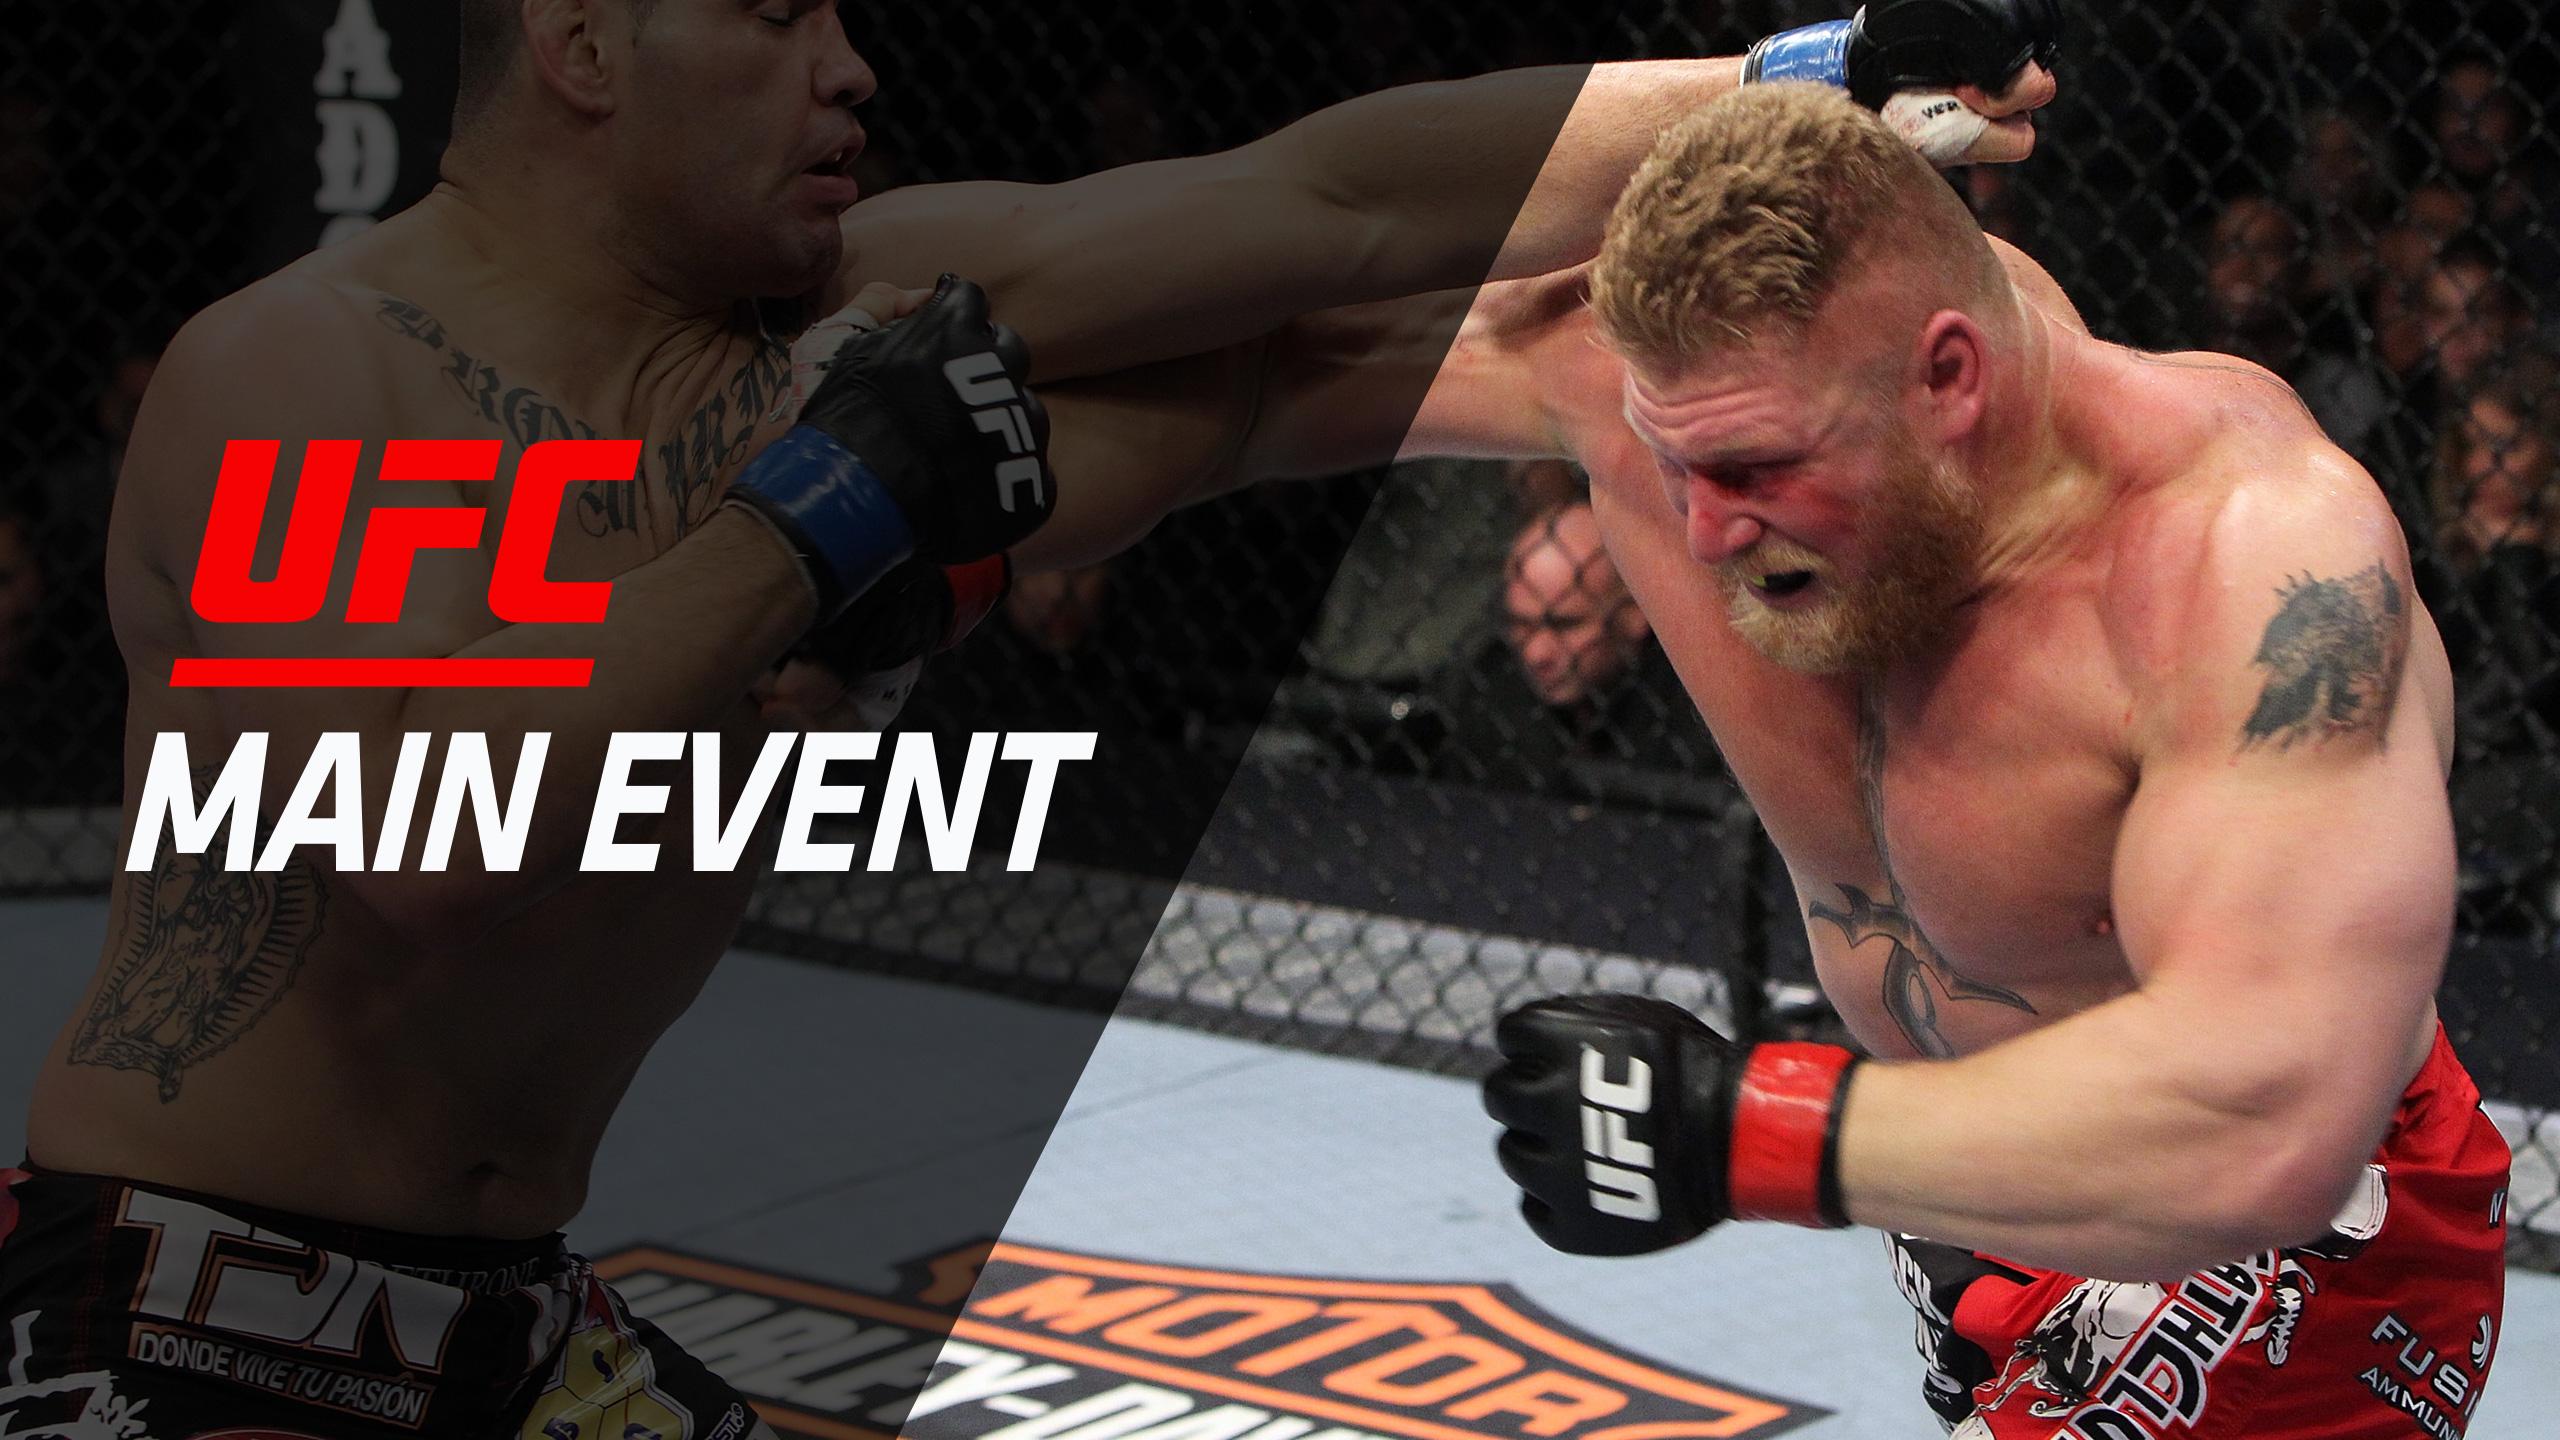 UFC Main Event: Lesnar vs. Velasquez